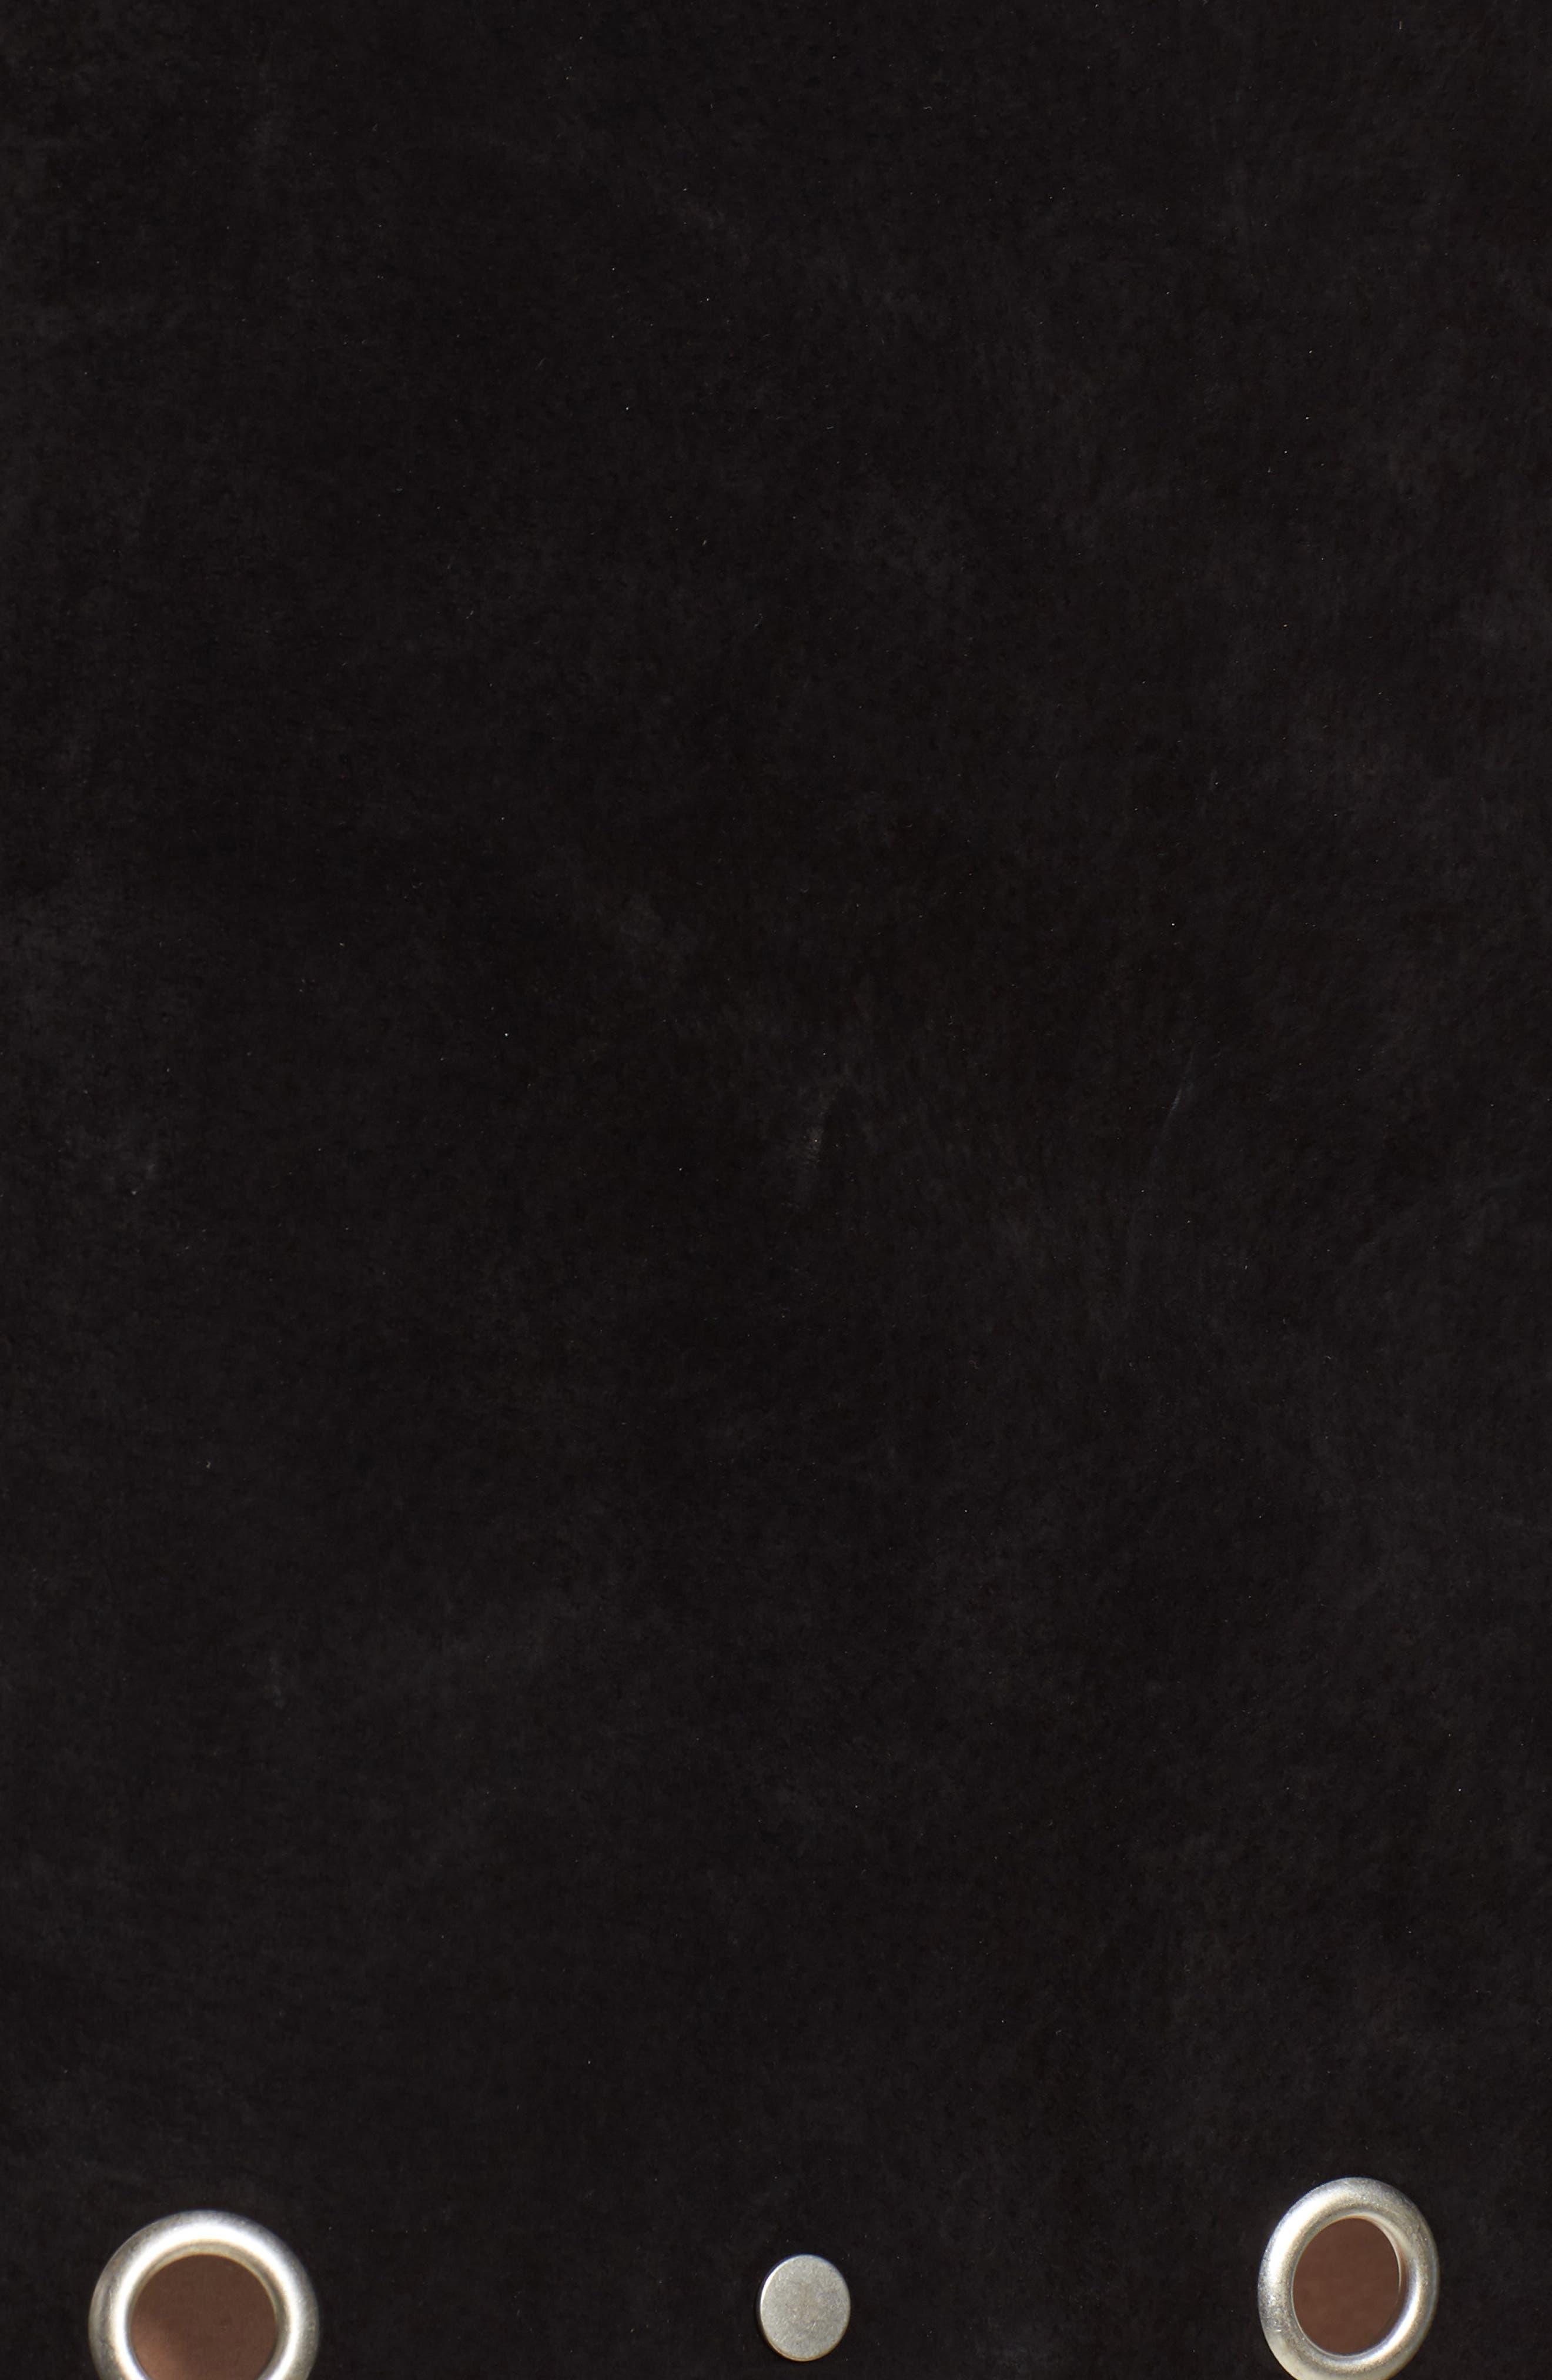 Grommet Suede Skirt,                             Alternate thumbnail 5, color,                             CASTLE BLACK